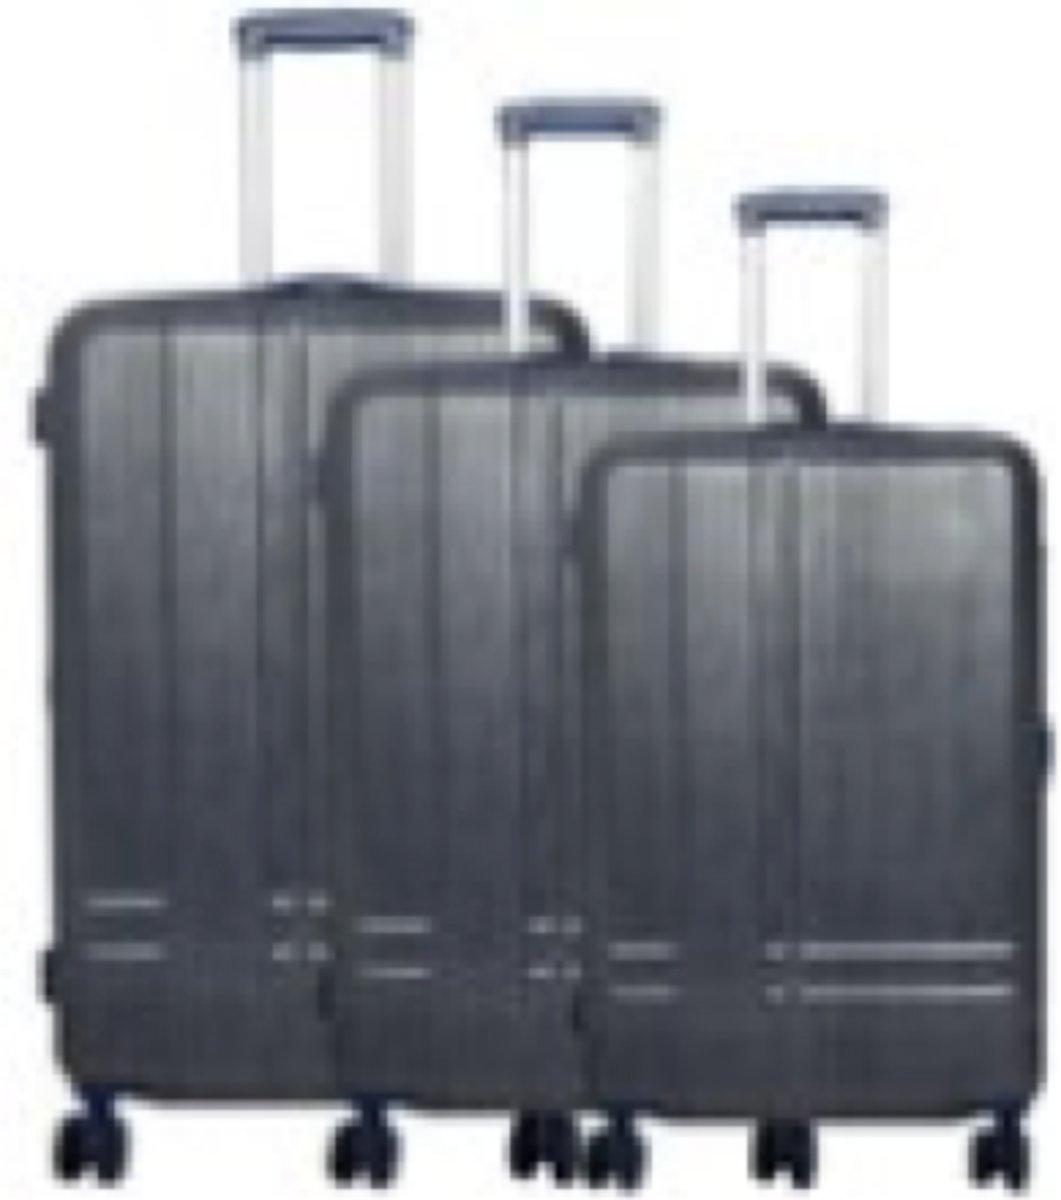 3 delig koffer set 100% polycarbonaat Samos blauw kopen